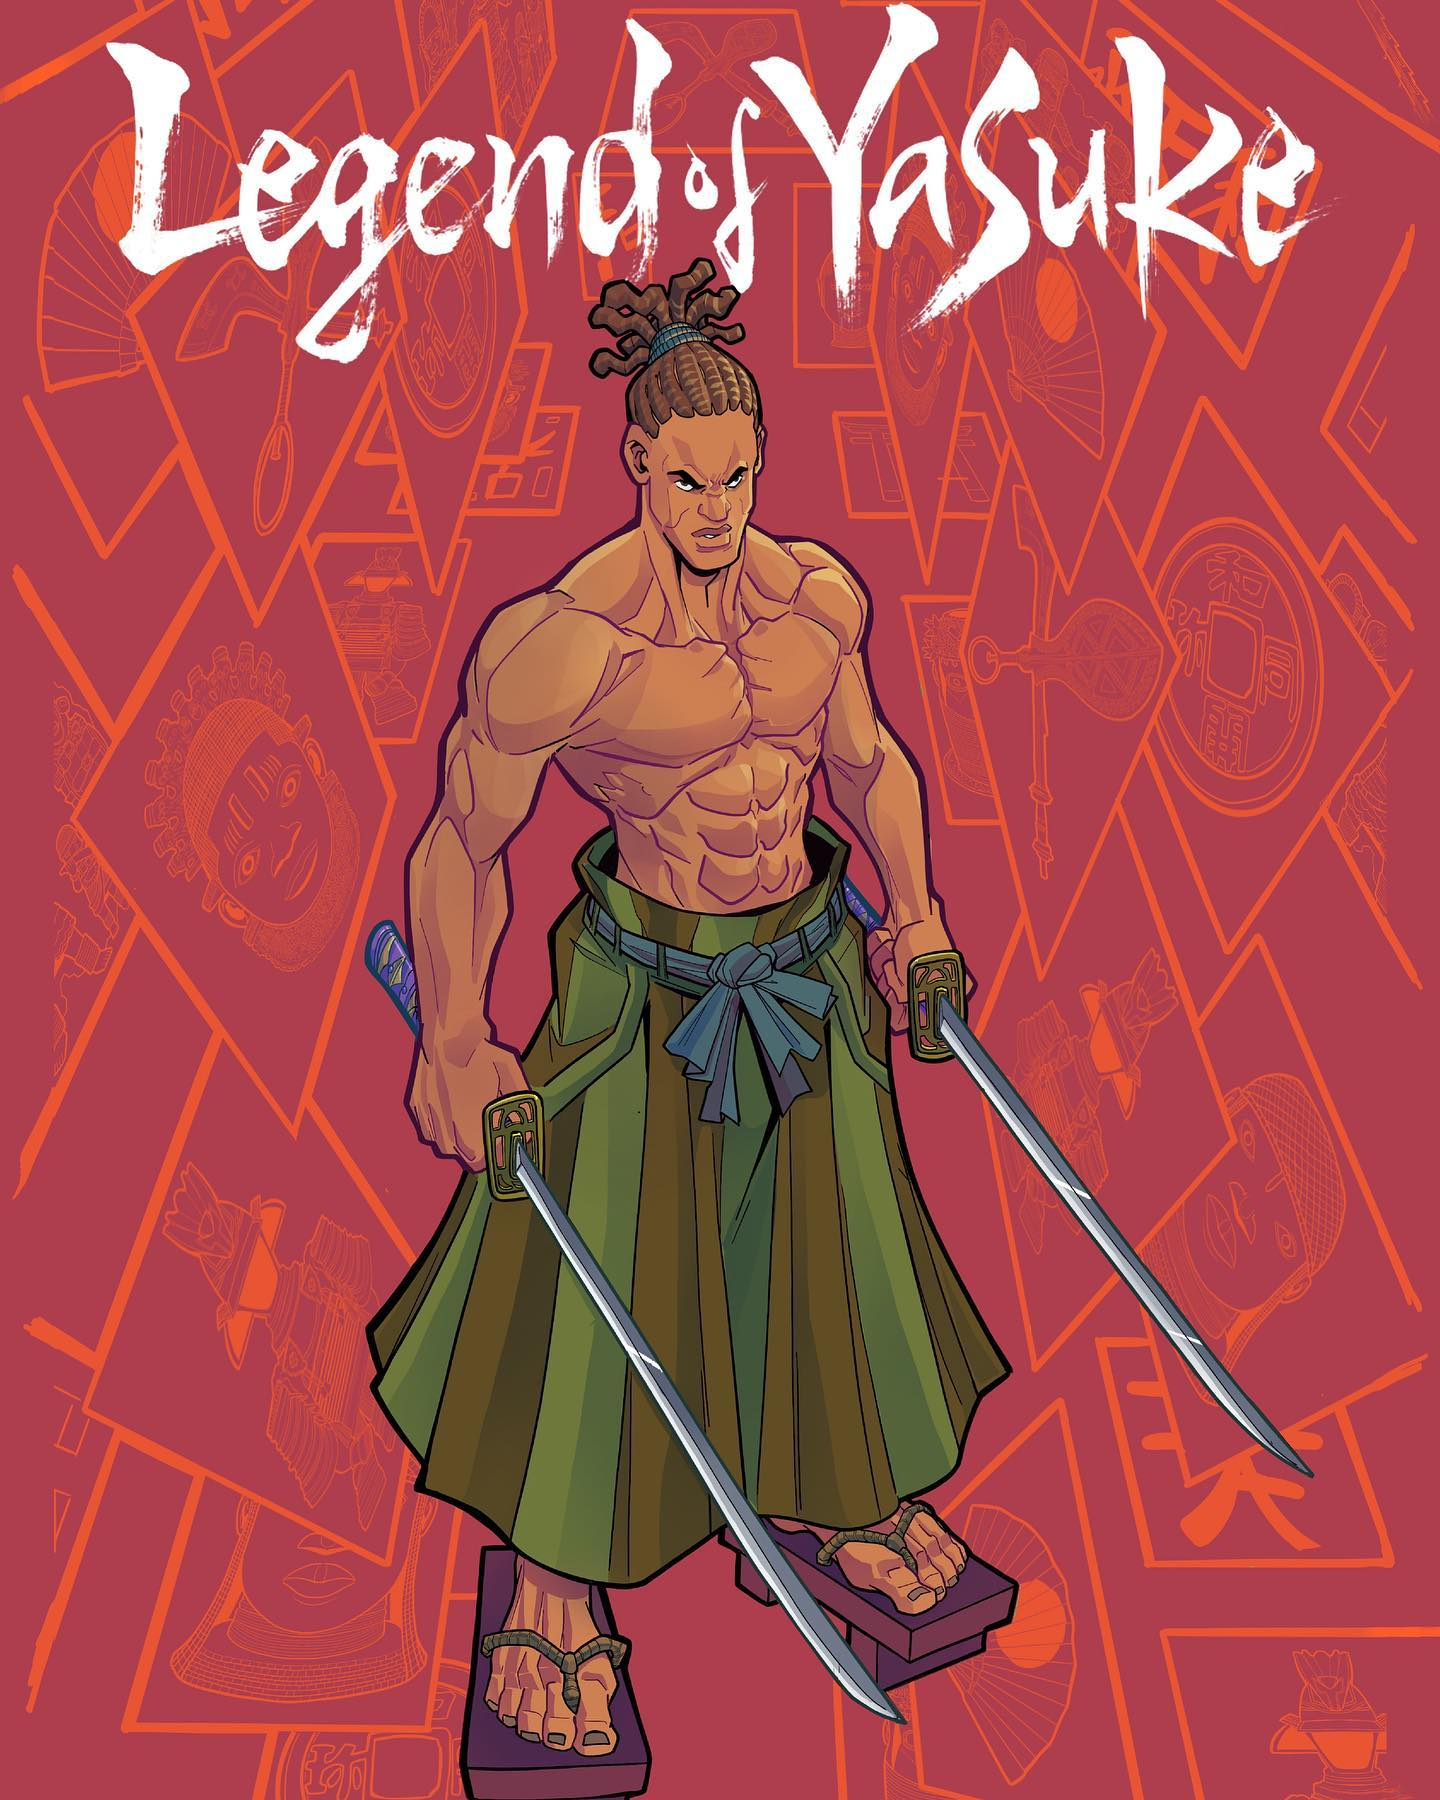 Legend of Yasuke by TAG Comics